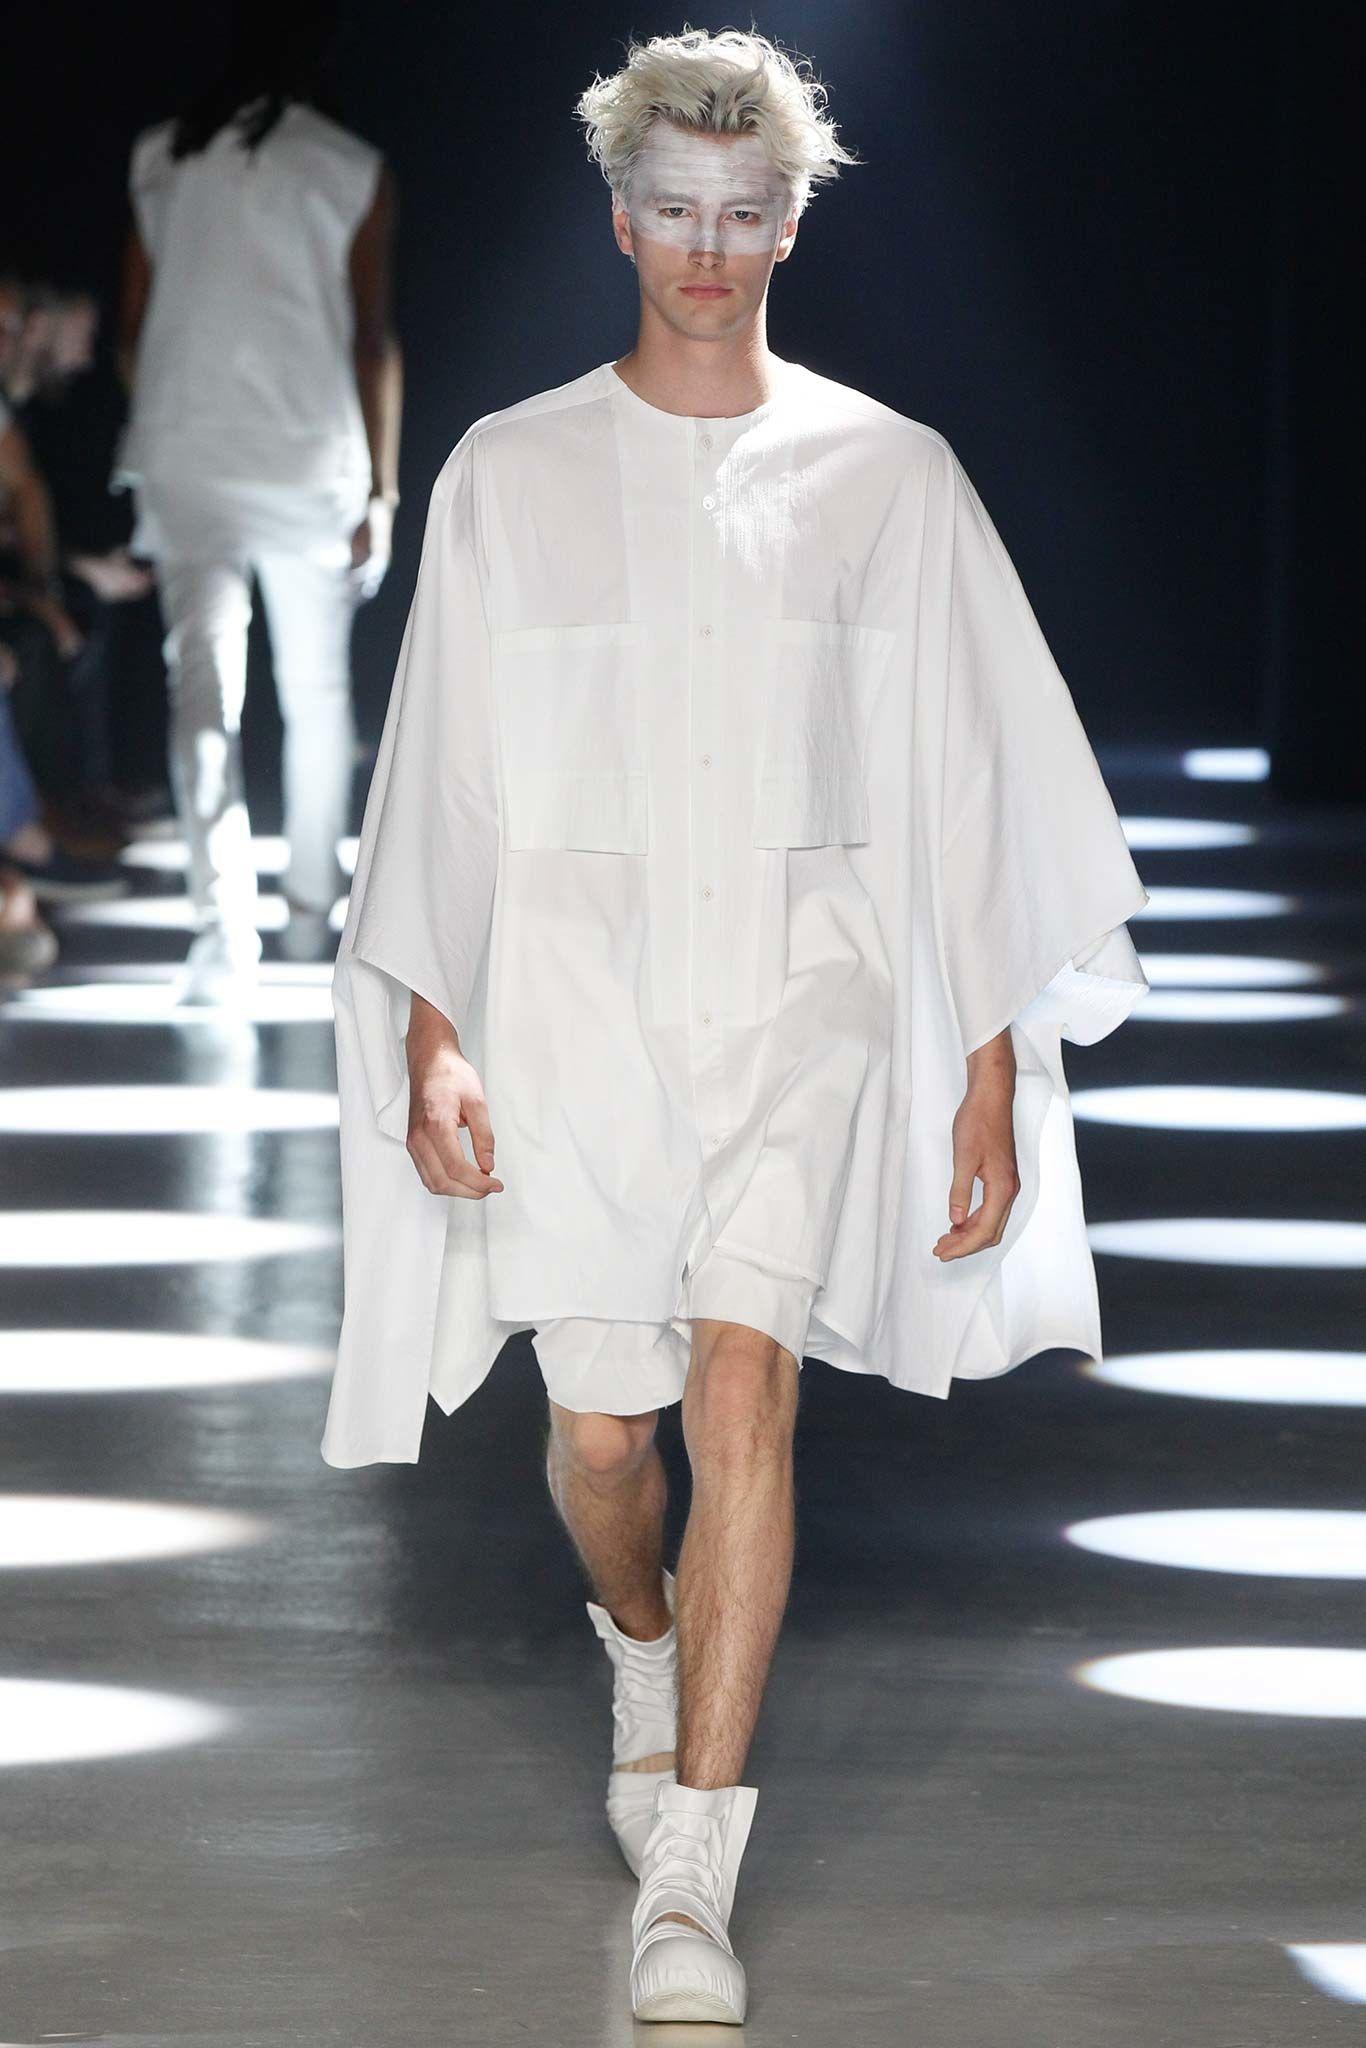 Alexandre Plokhov Spring 2016 Menswear Fashion Show